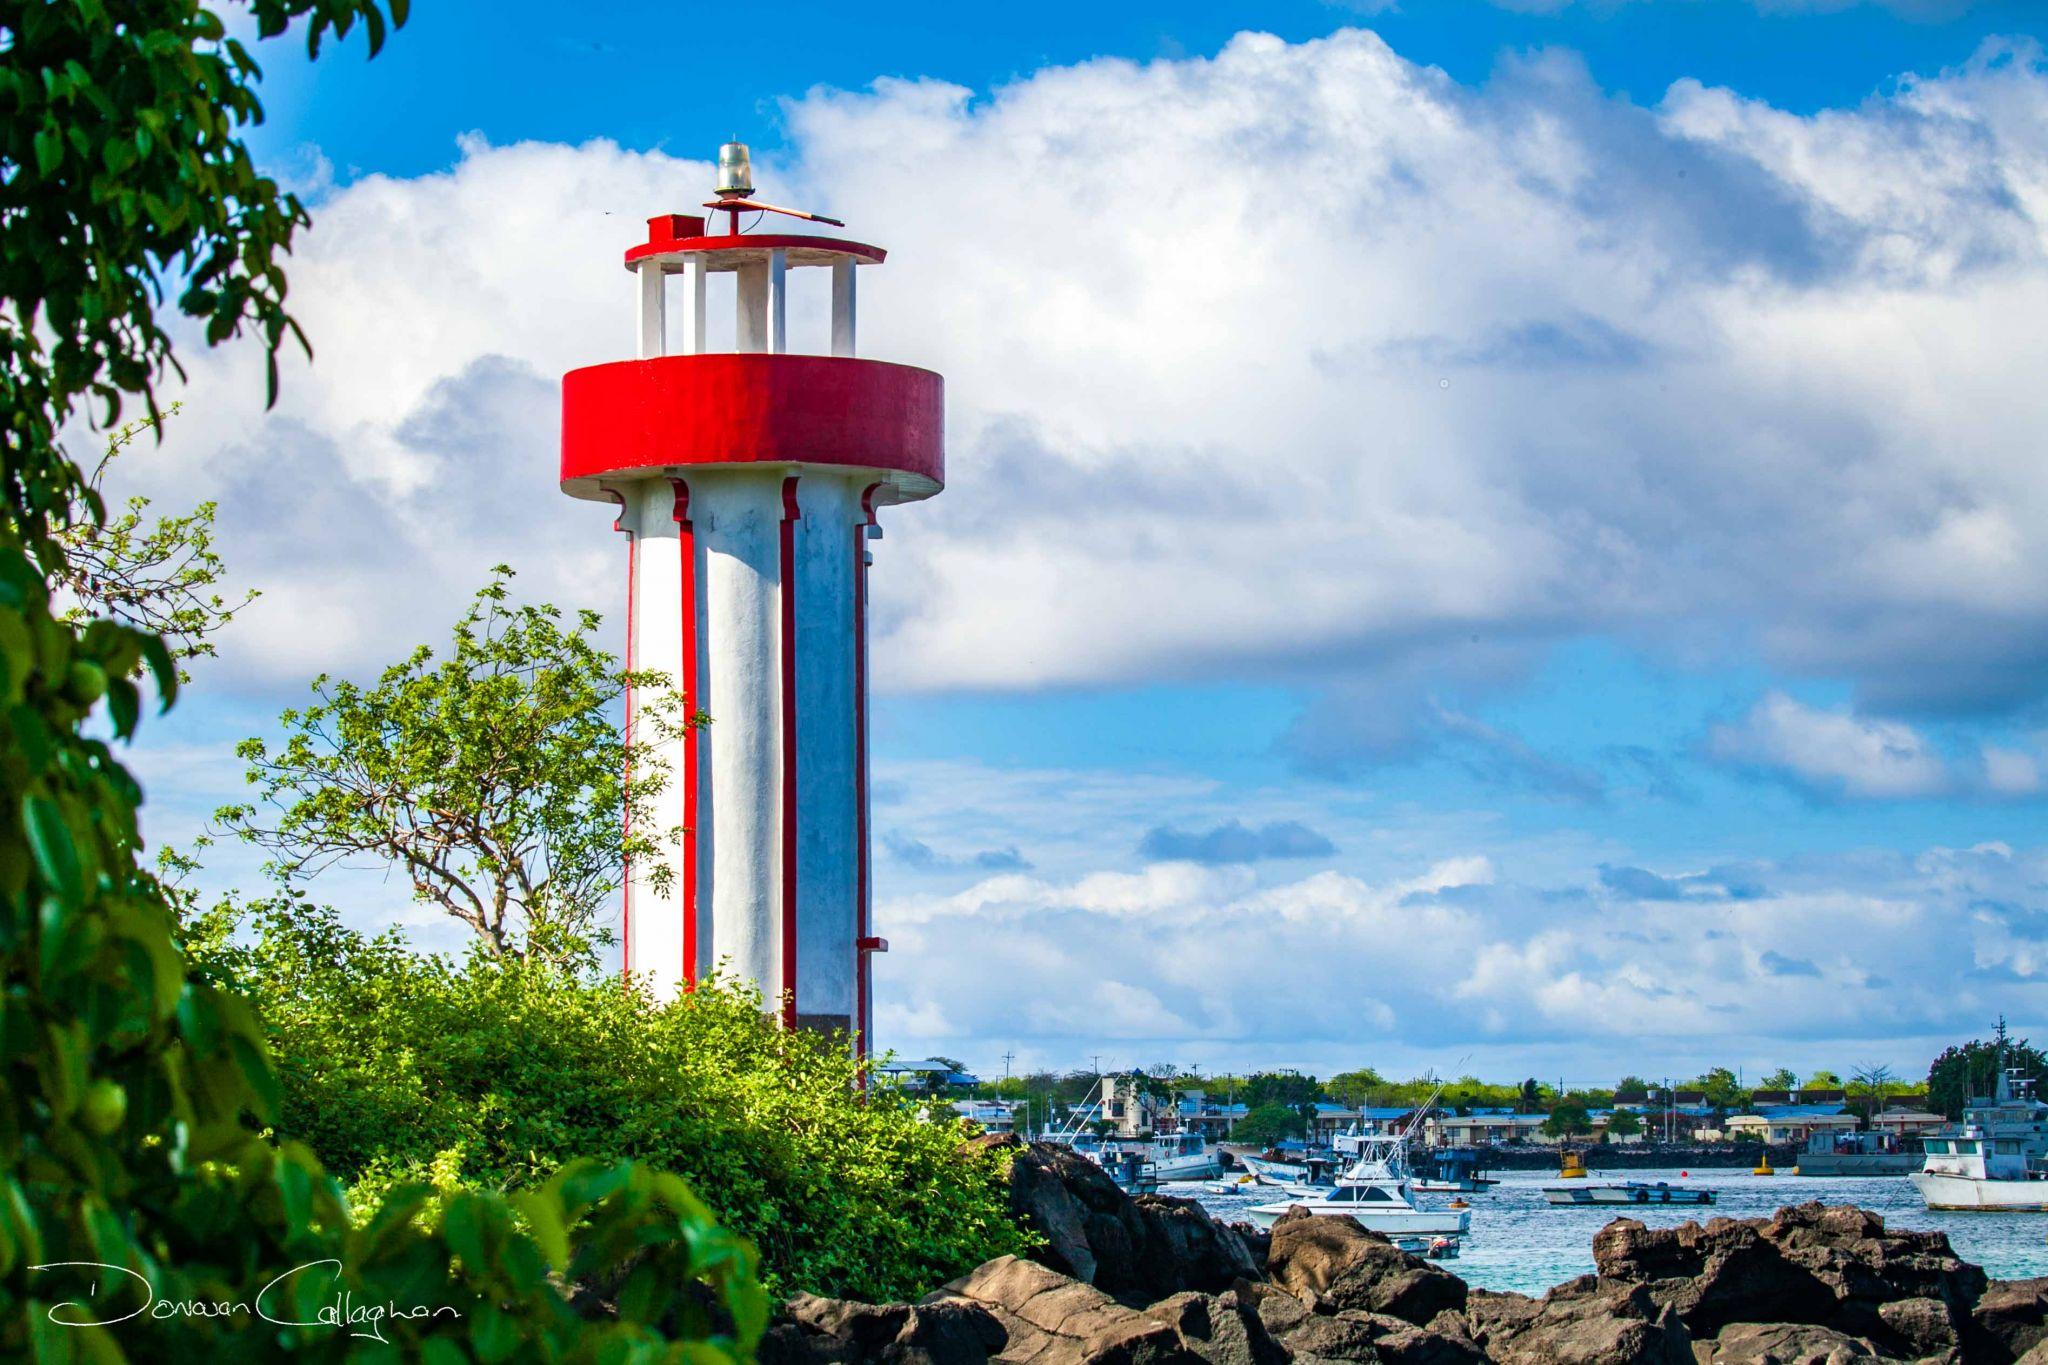 San Cristobal Lighthouse Galapagos Islands, Ecuador